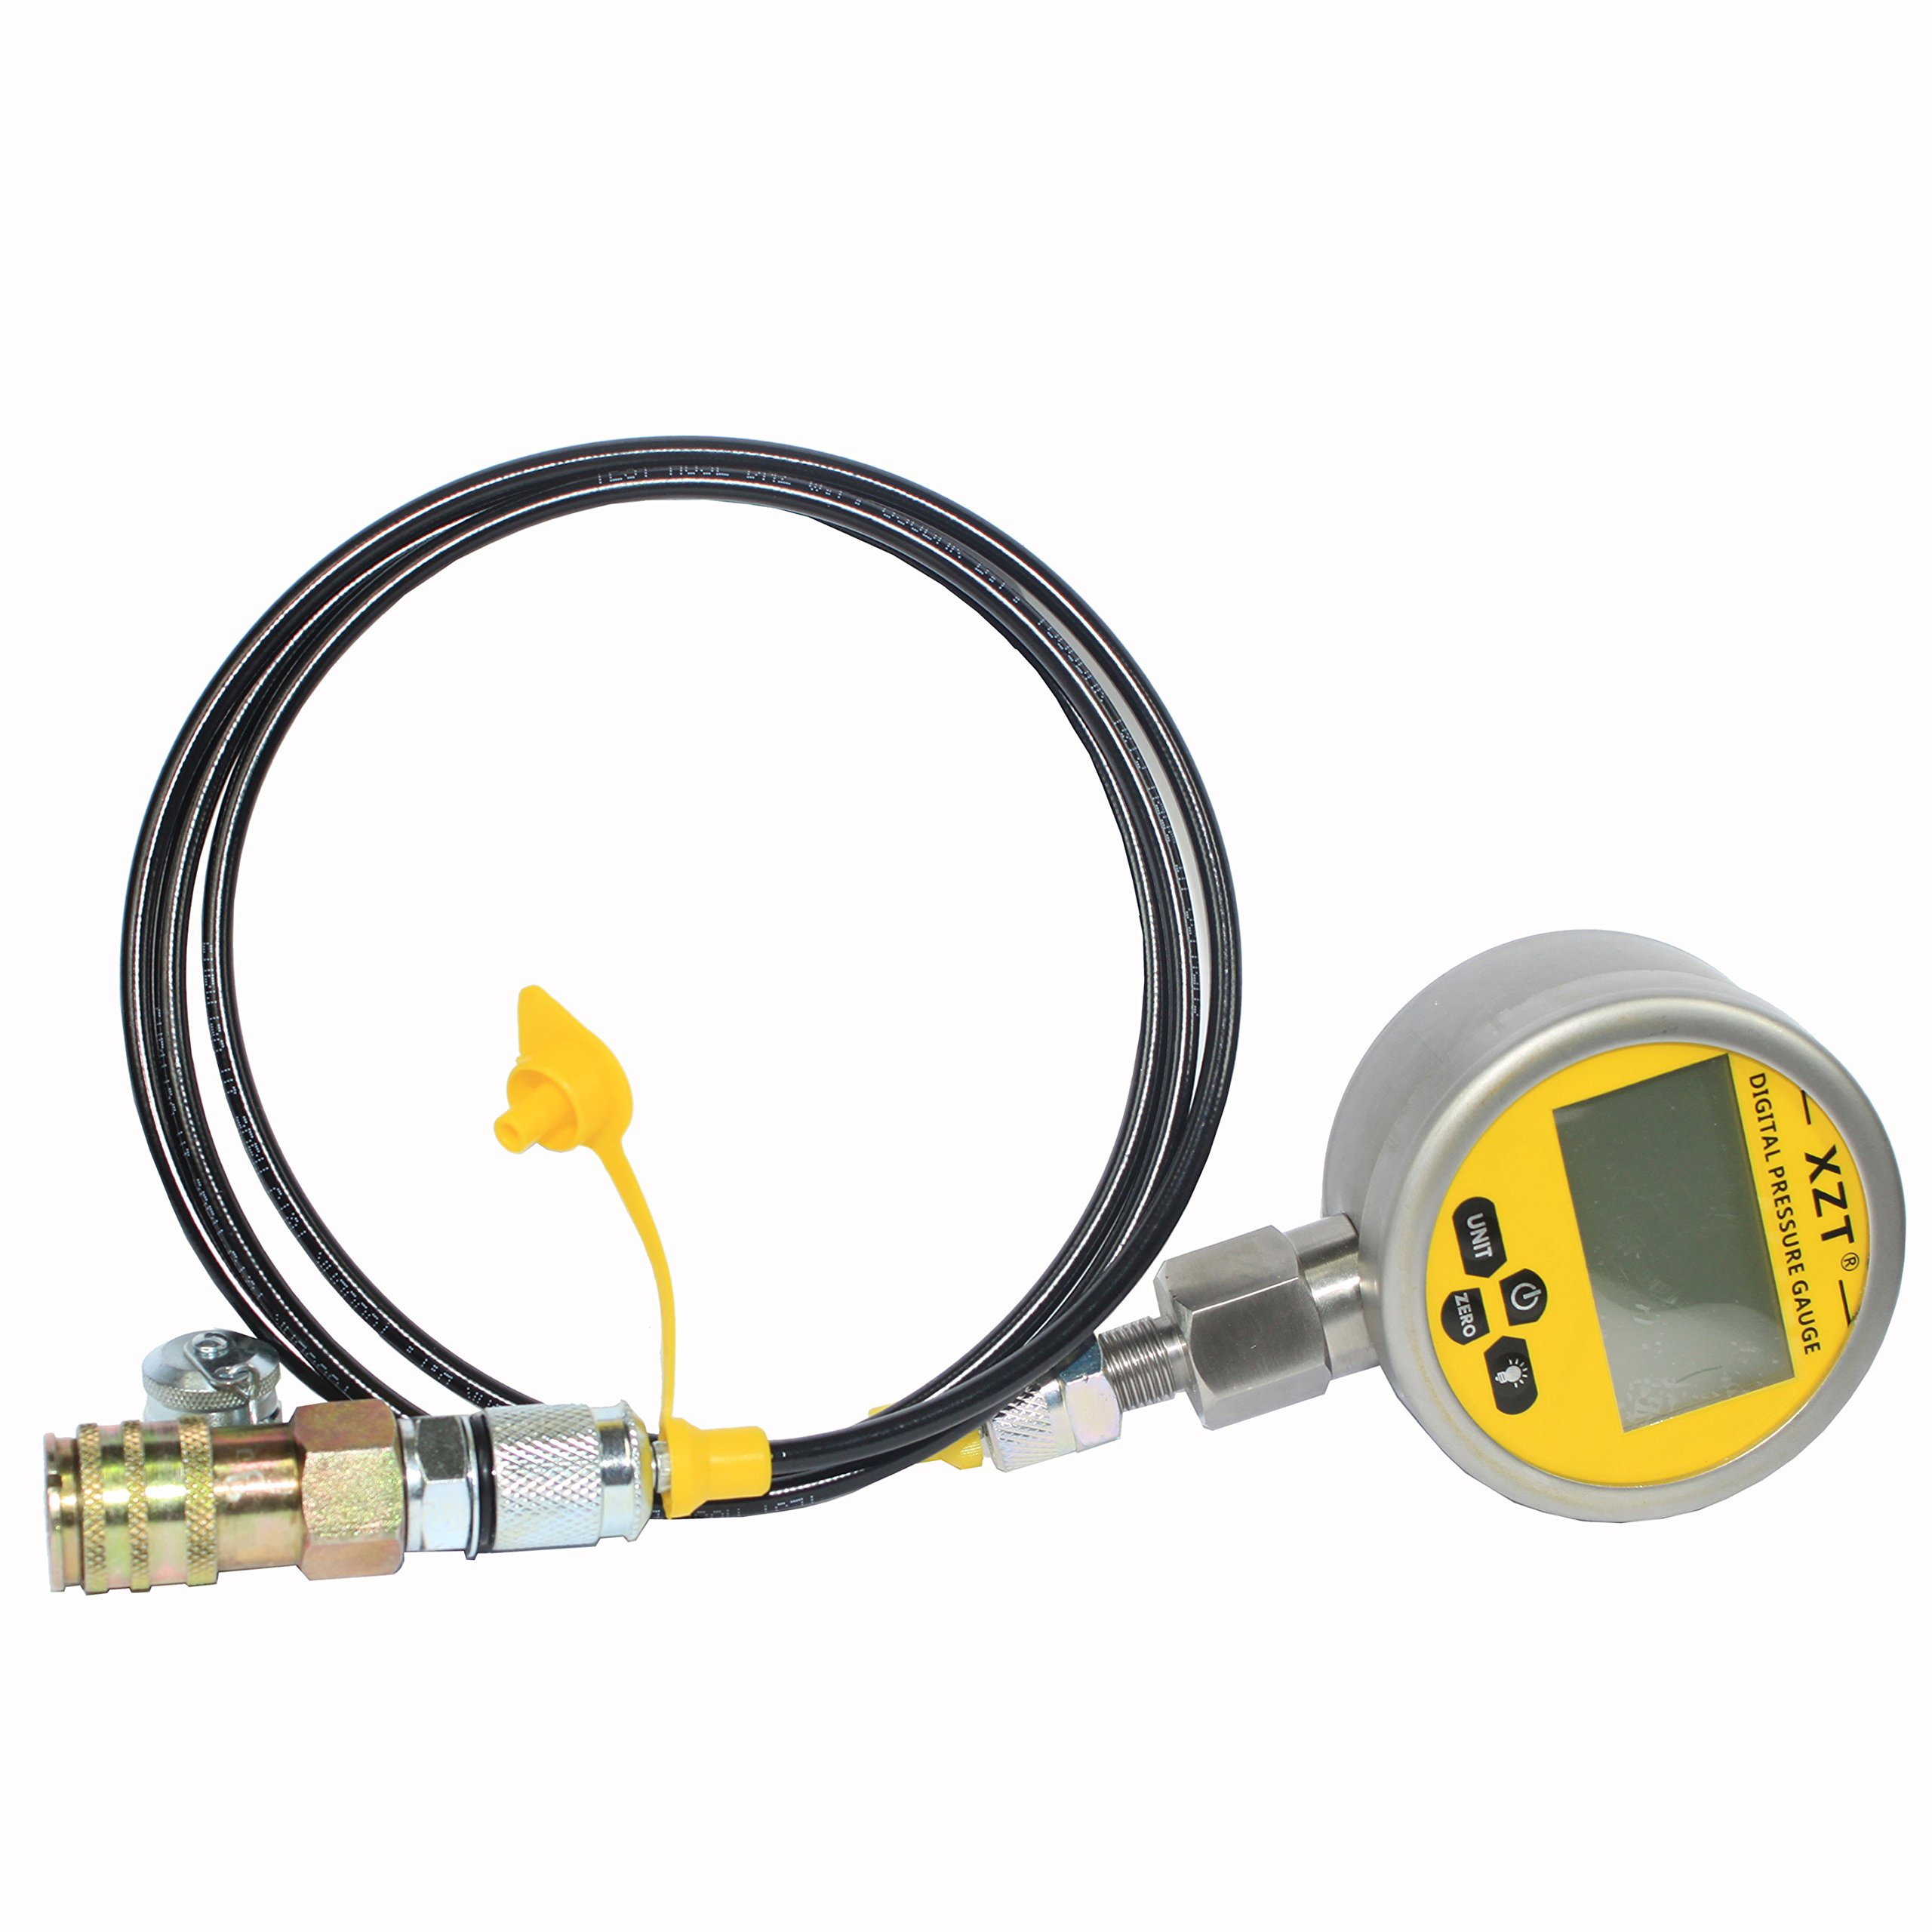 XZT Kom-10000psi Digital Hydraulic Pressure Test Coupling Kit for Komatsu Hitachi Excavator (10000PSI)